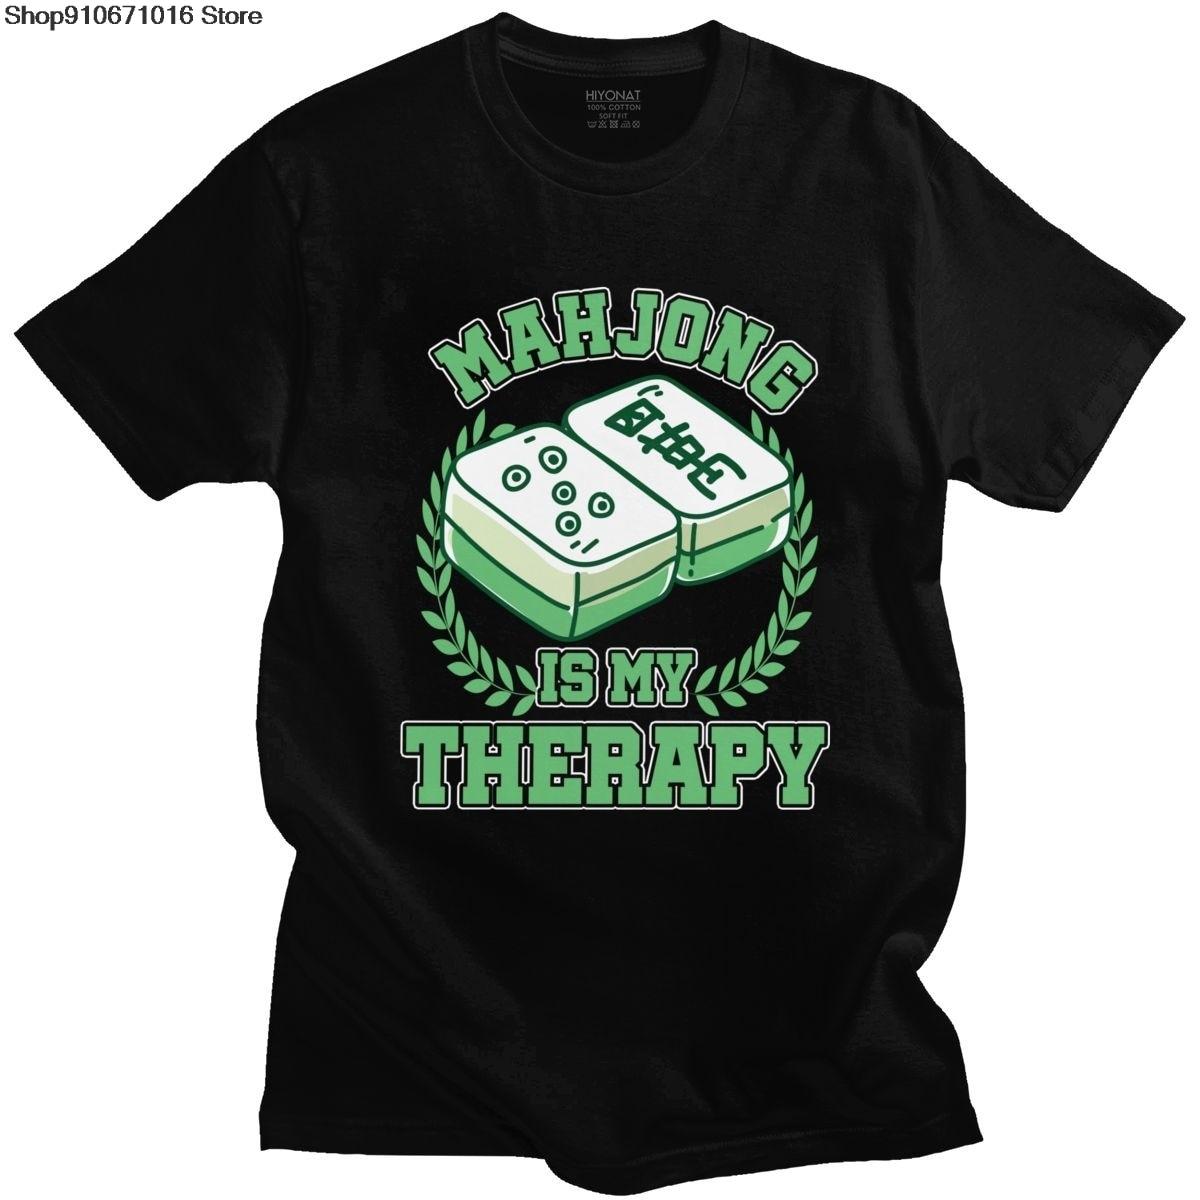 Mahjong to moja terapia T Shirt Men 100% bawełna stylowa koszulka z krótkim rękawem chińska kultura i gra rozrywkowa Mah Jong Tee